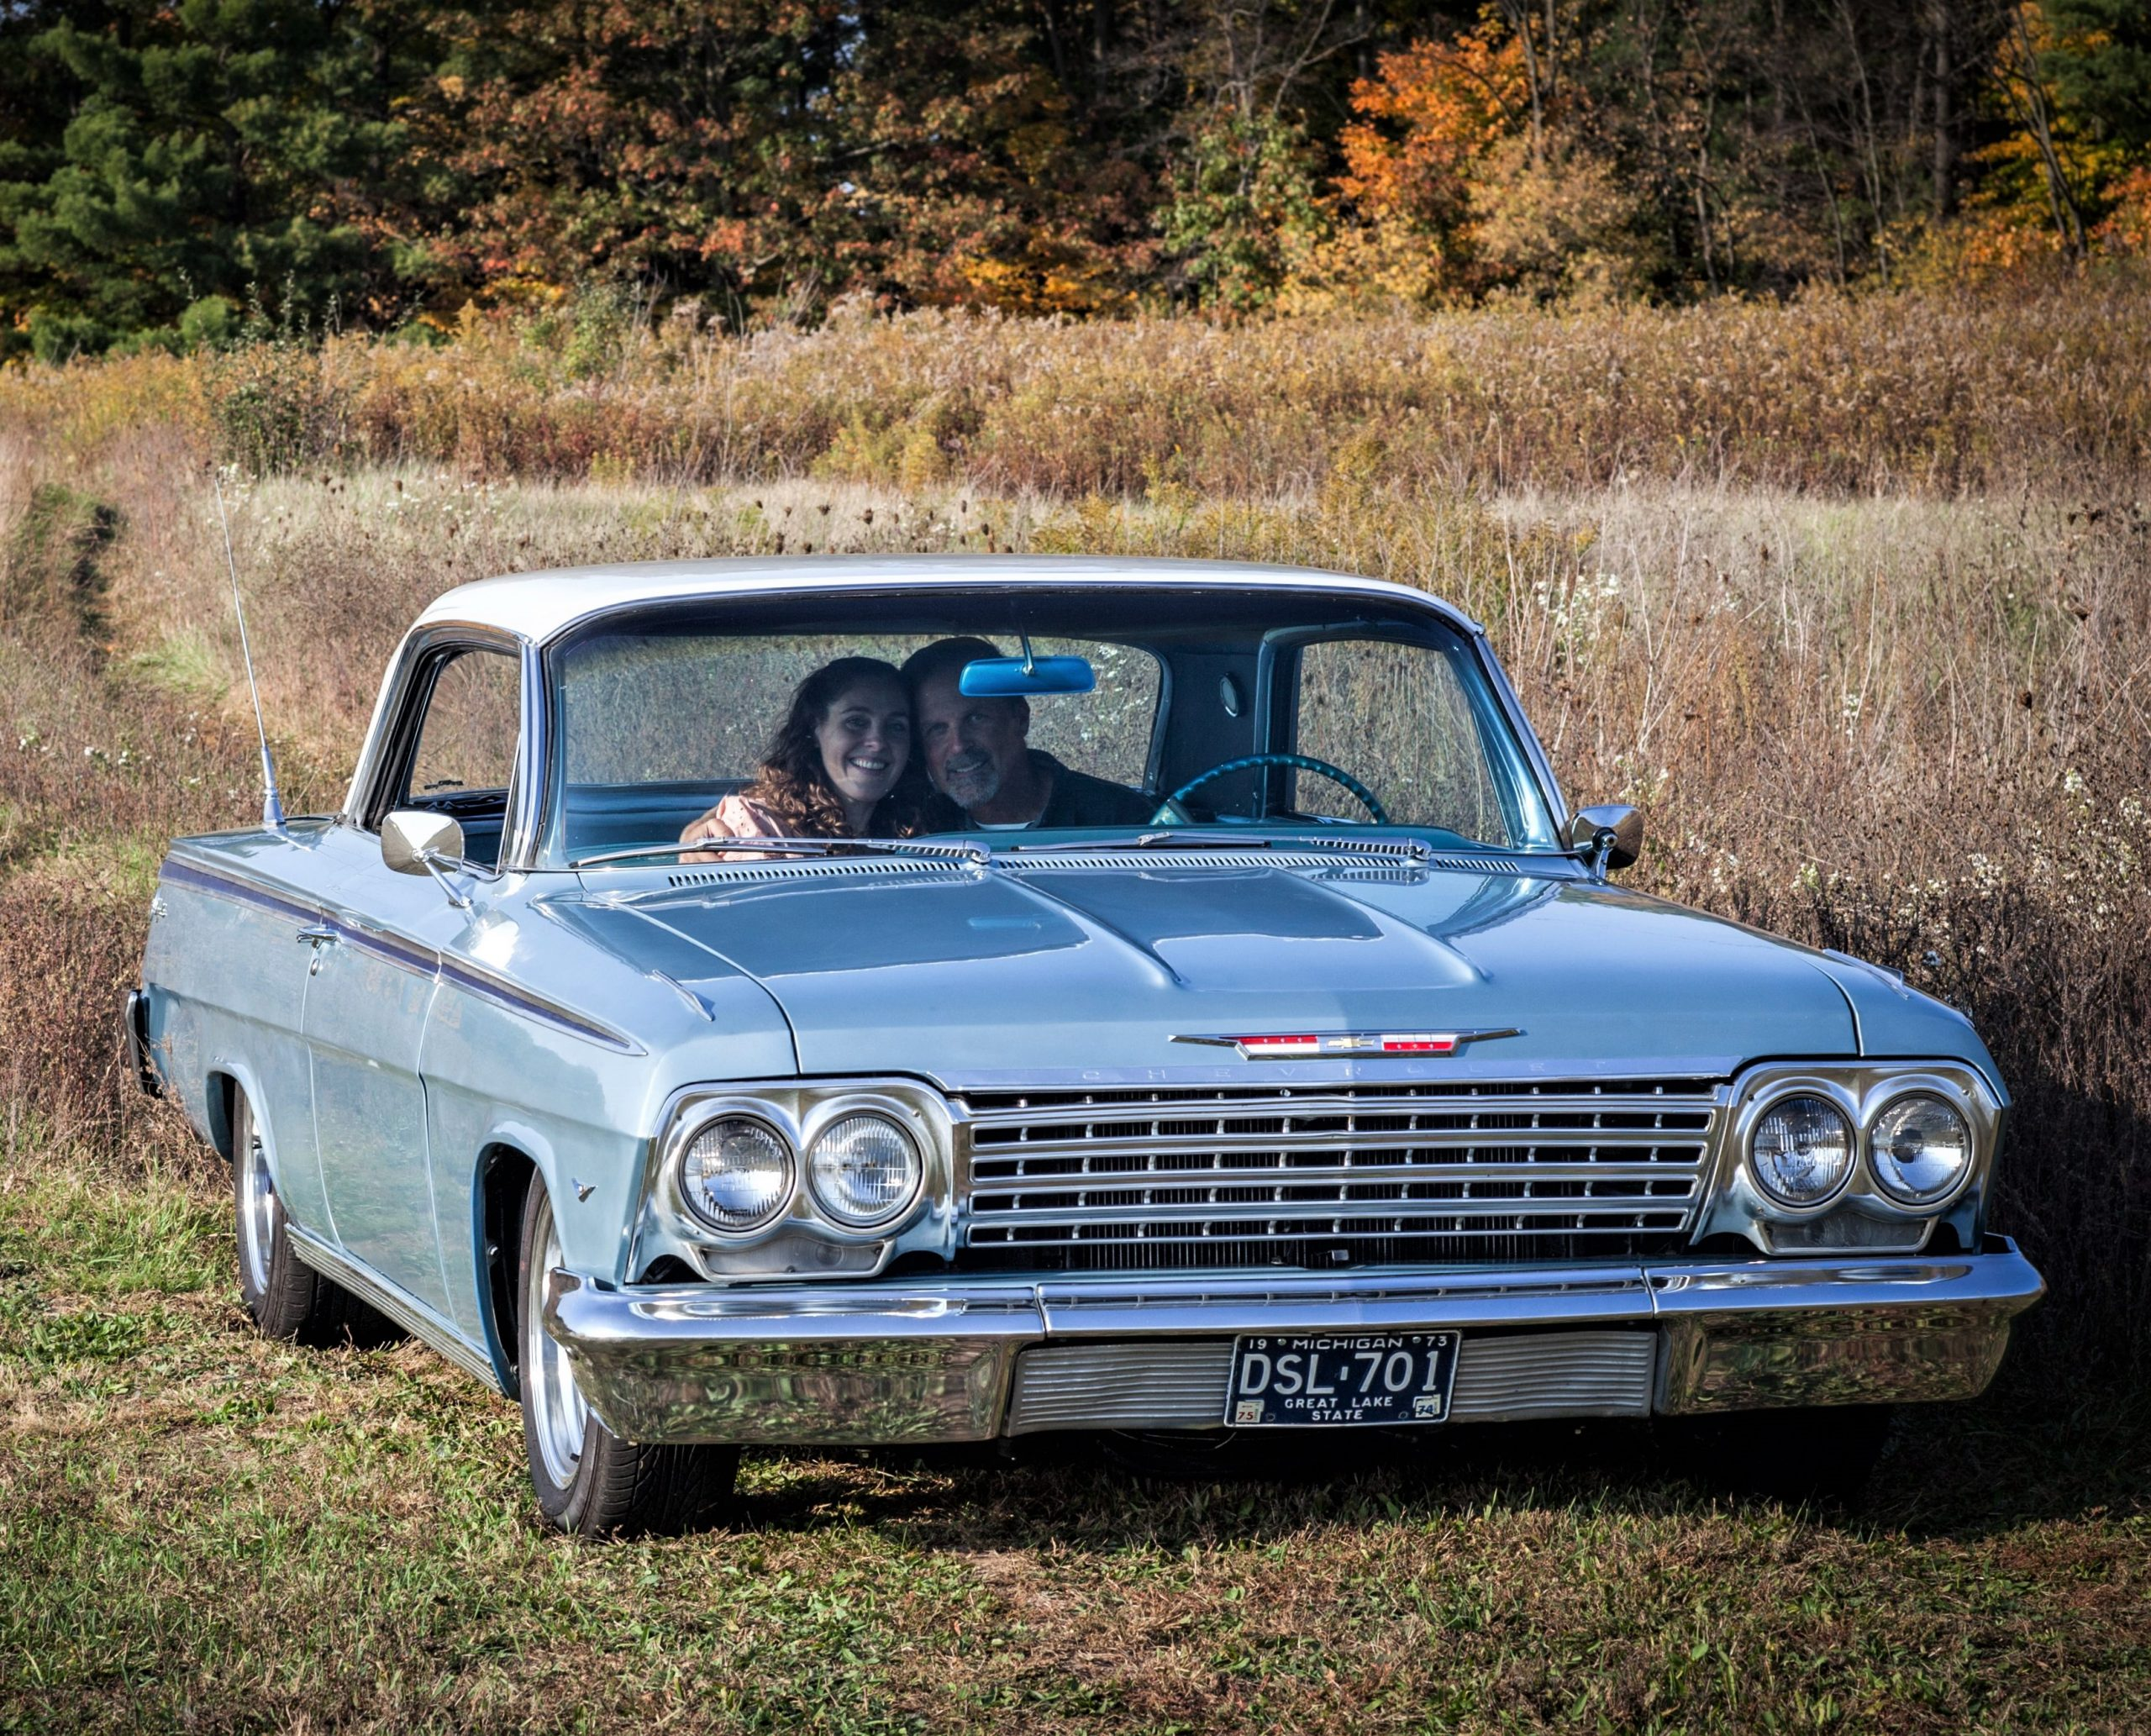 Jason Prince - 1962 Chevrolet Impala - Jason and Lynn